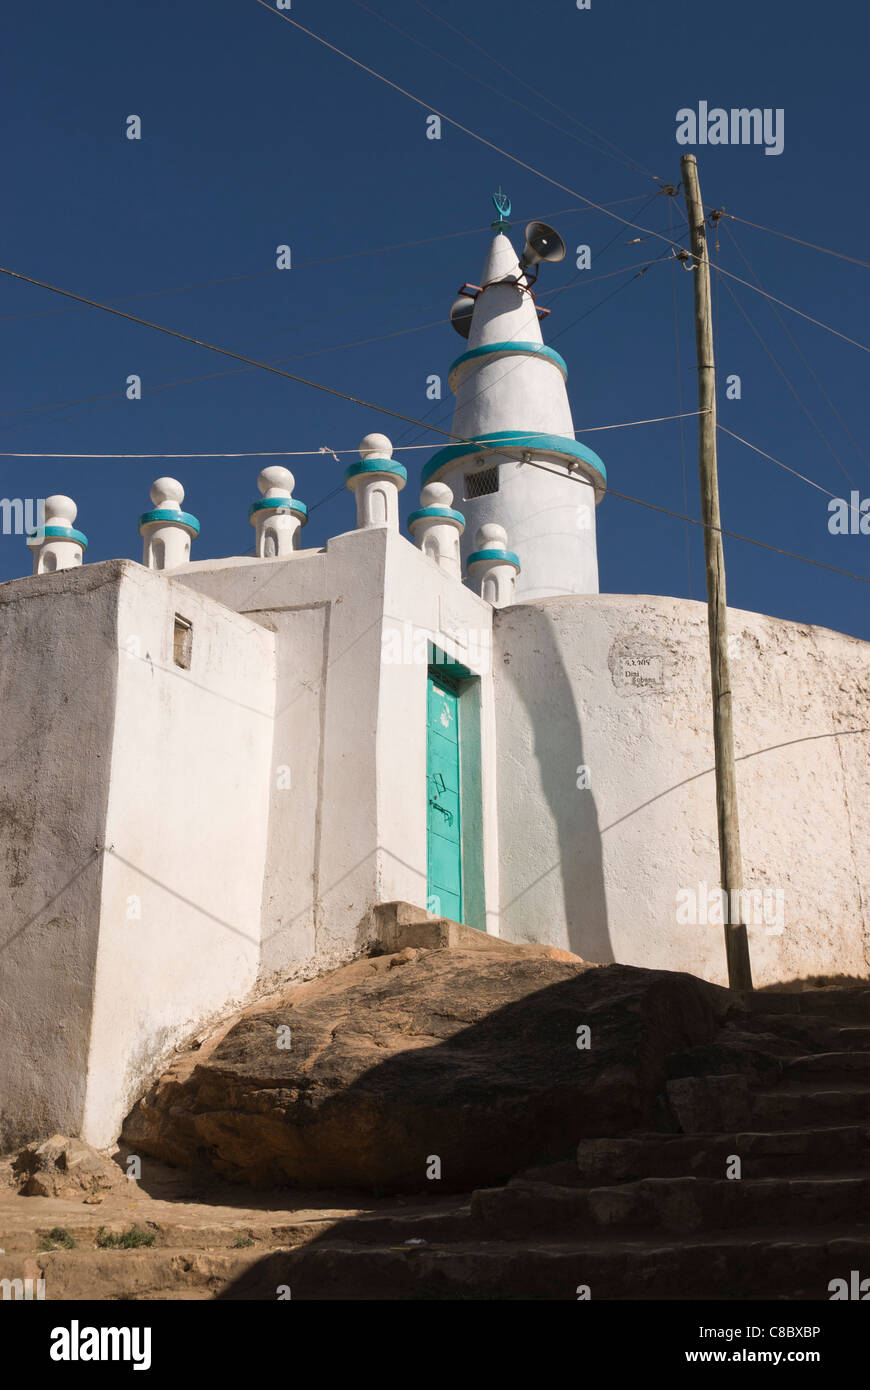 Elk200-4074v Ethiopia, Harar, mosque - Stock Image